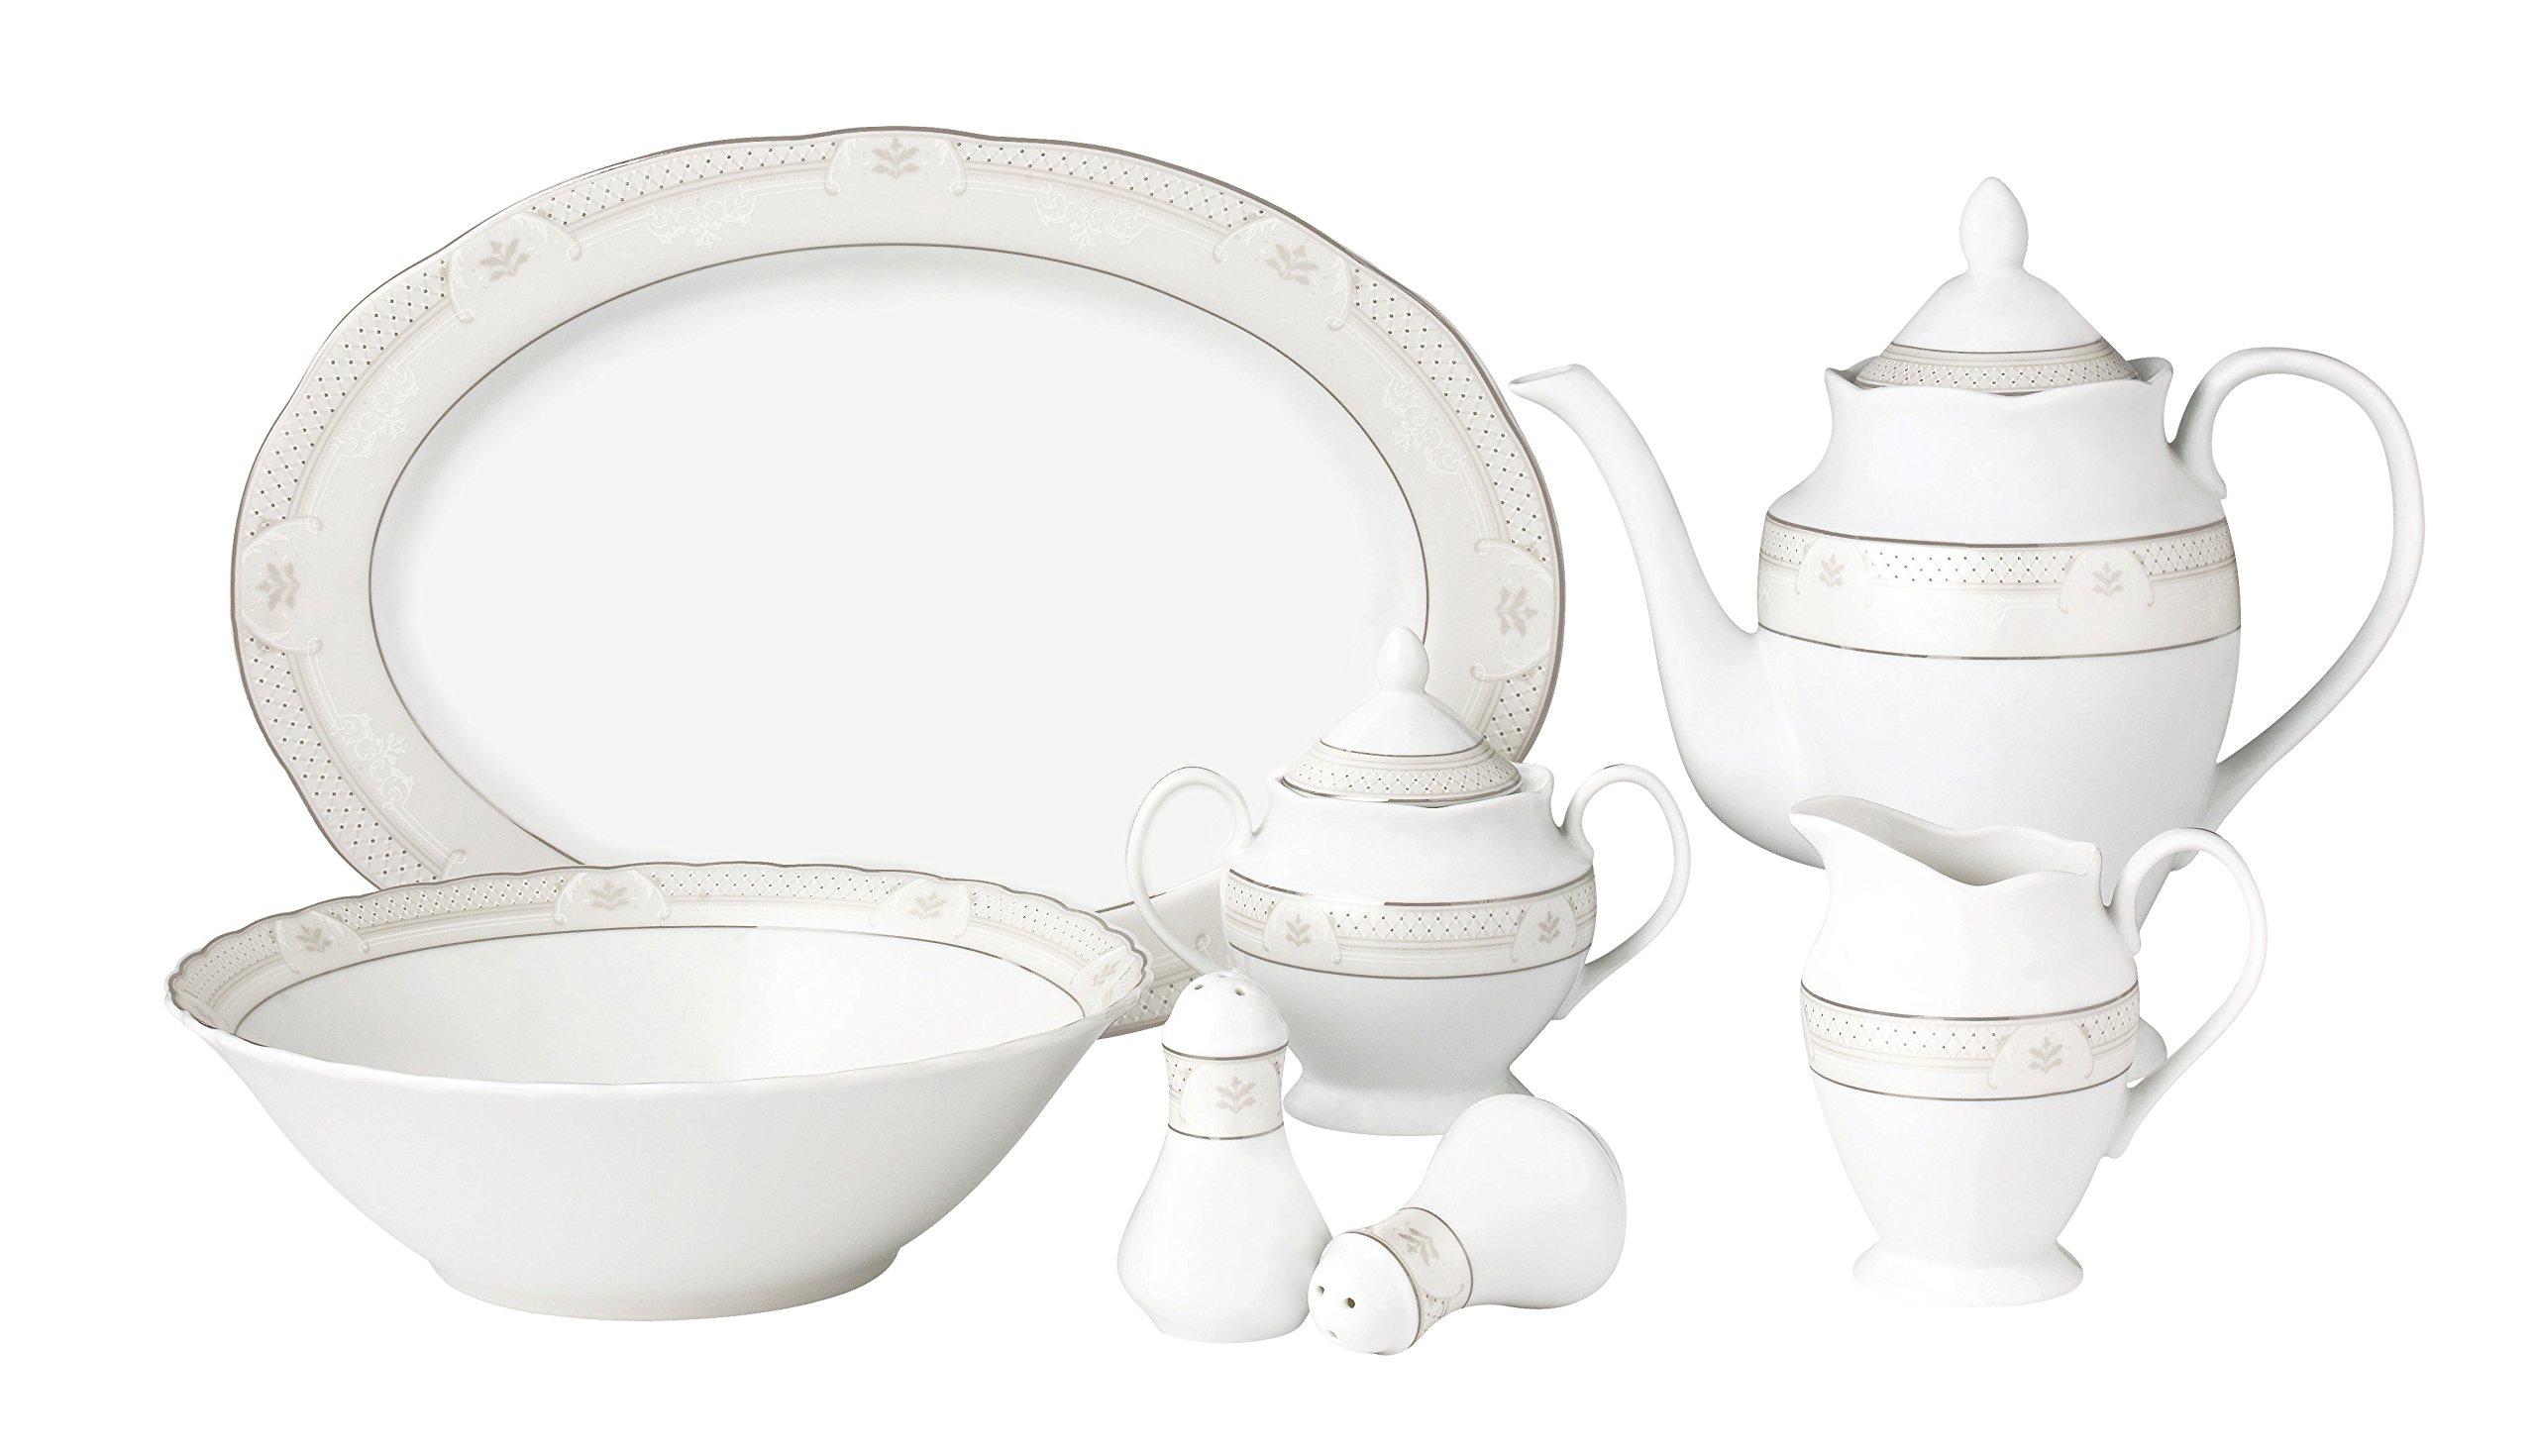 Lorren Home Trends Atara-57 57 Piece Wavy Porcelain Atara Collection Dinnerware Set, Silver